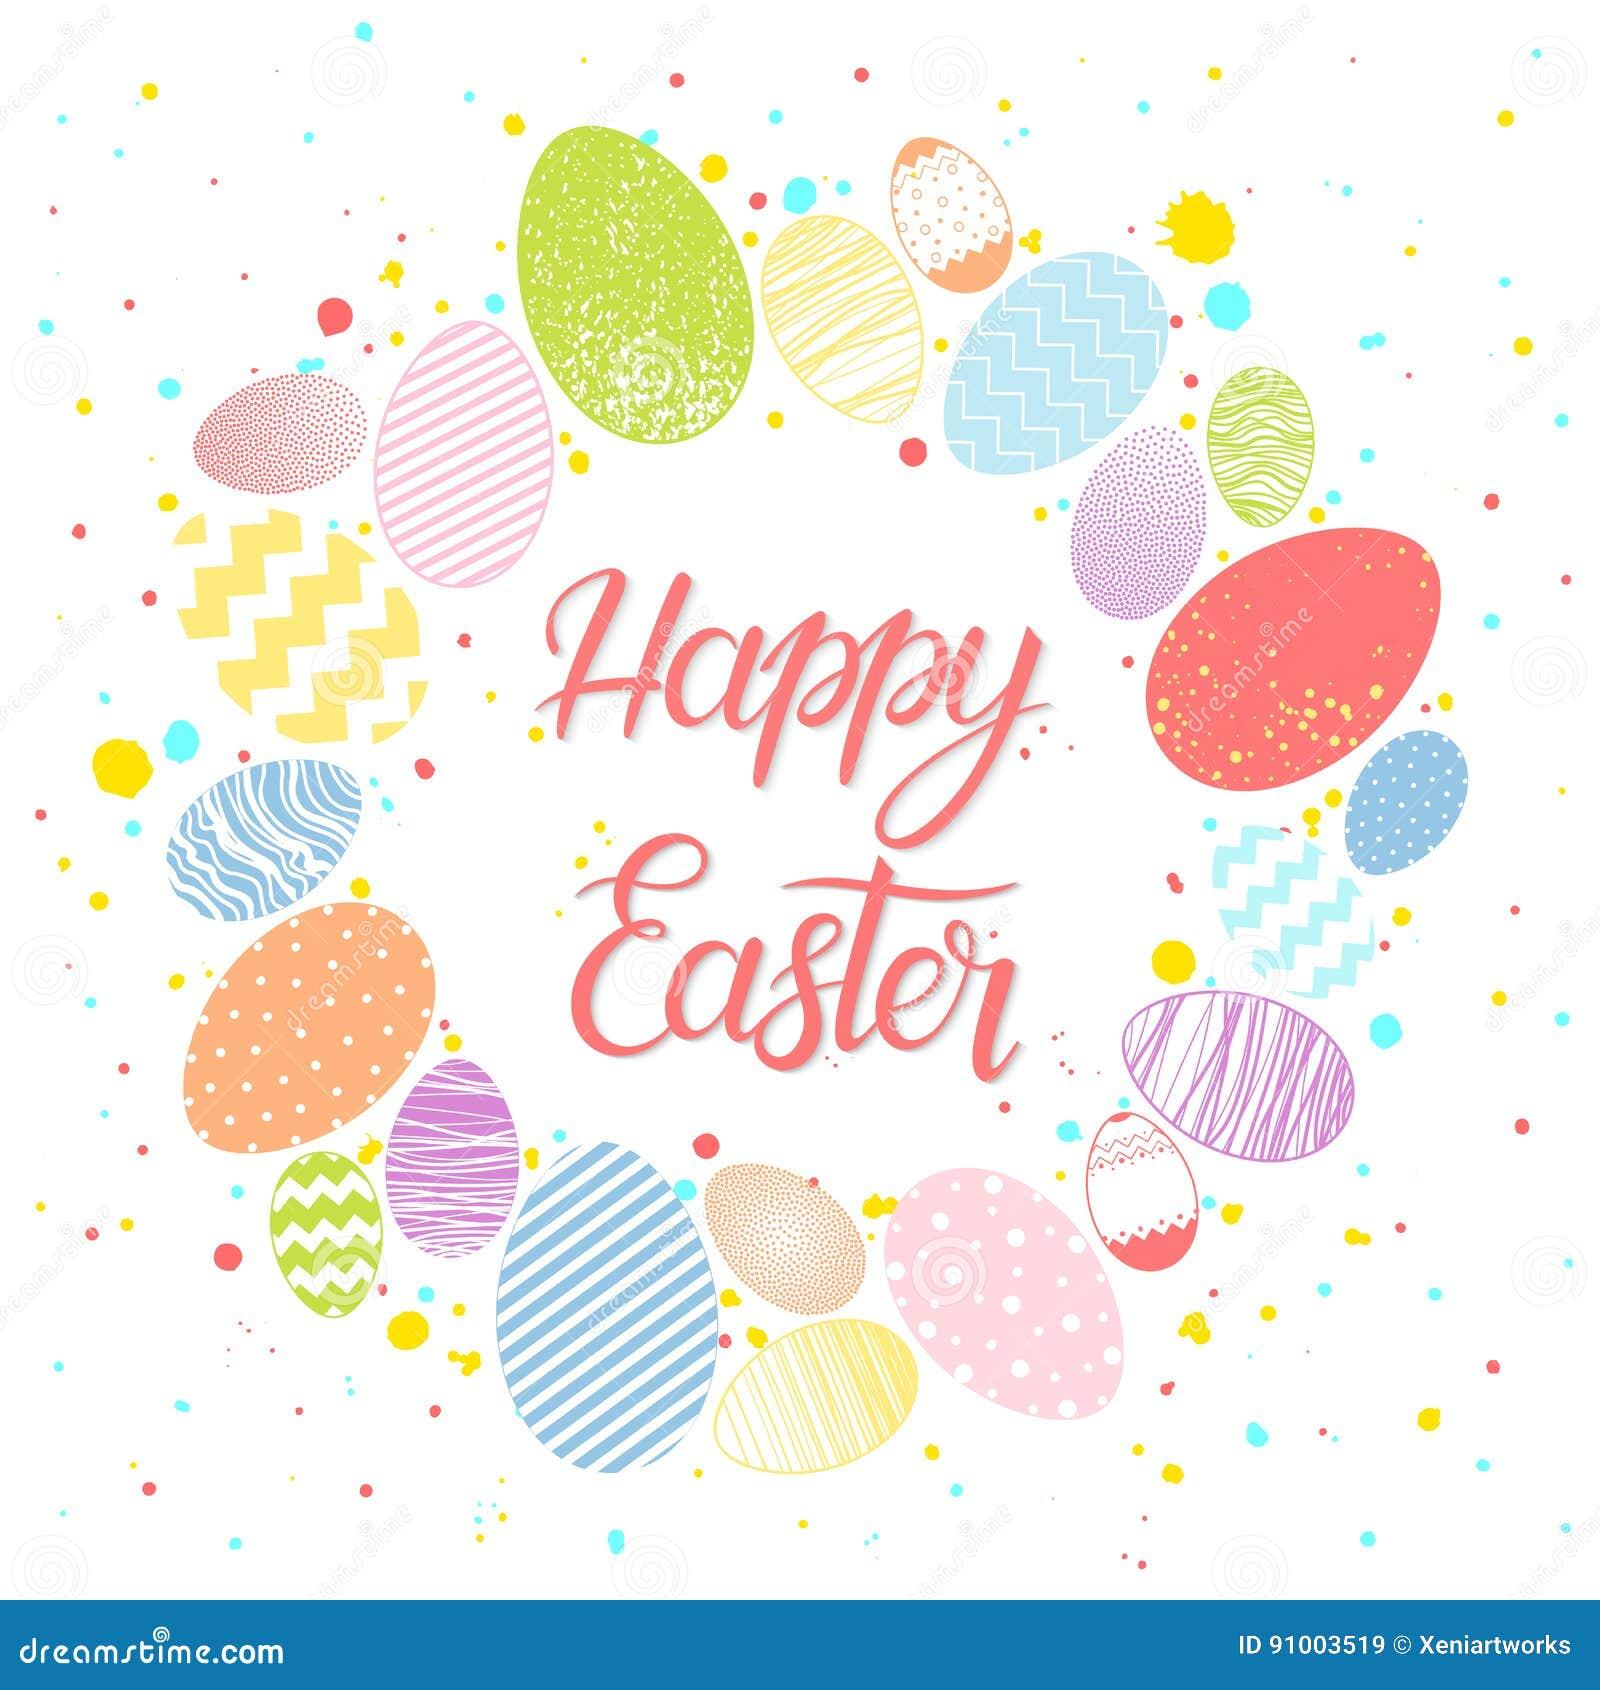 Easter Seasons Greetings Card Stock Illustration Illustration Of